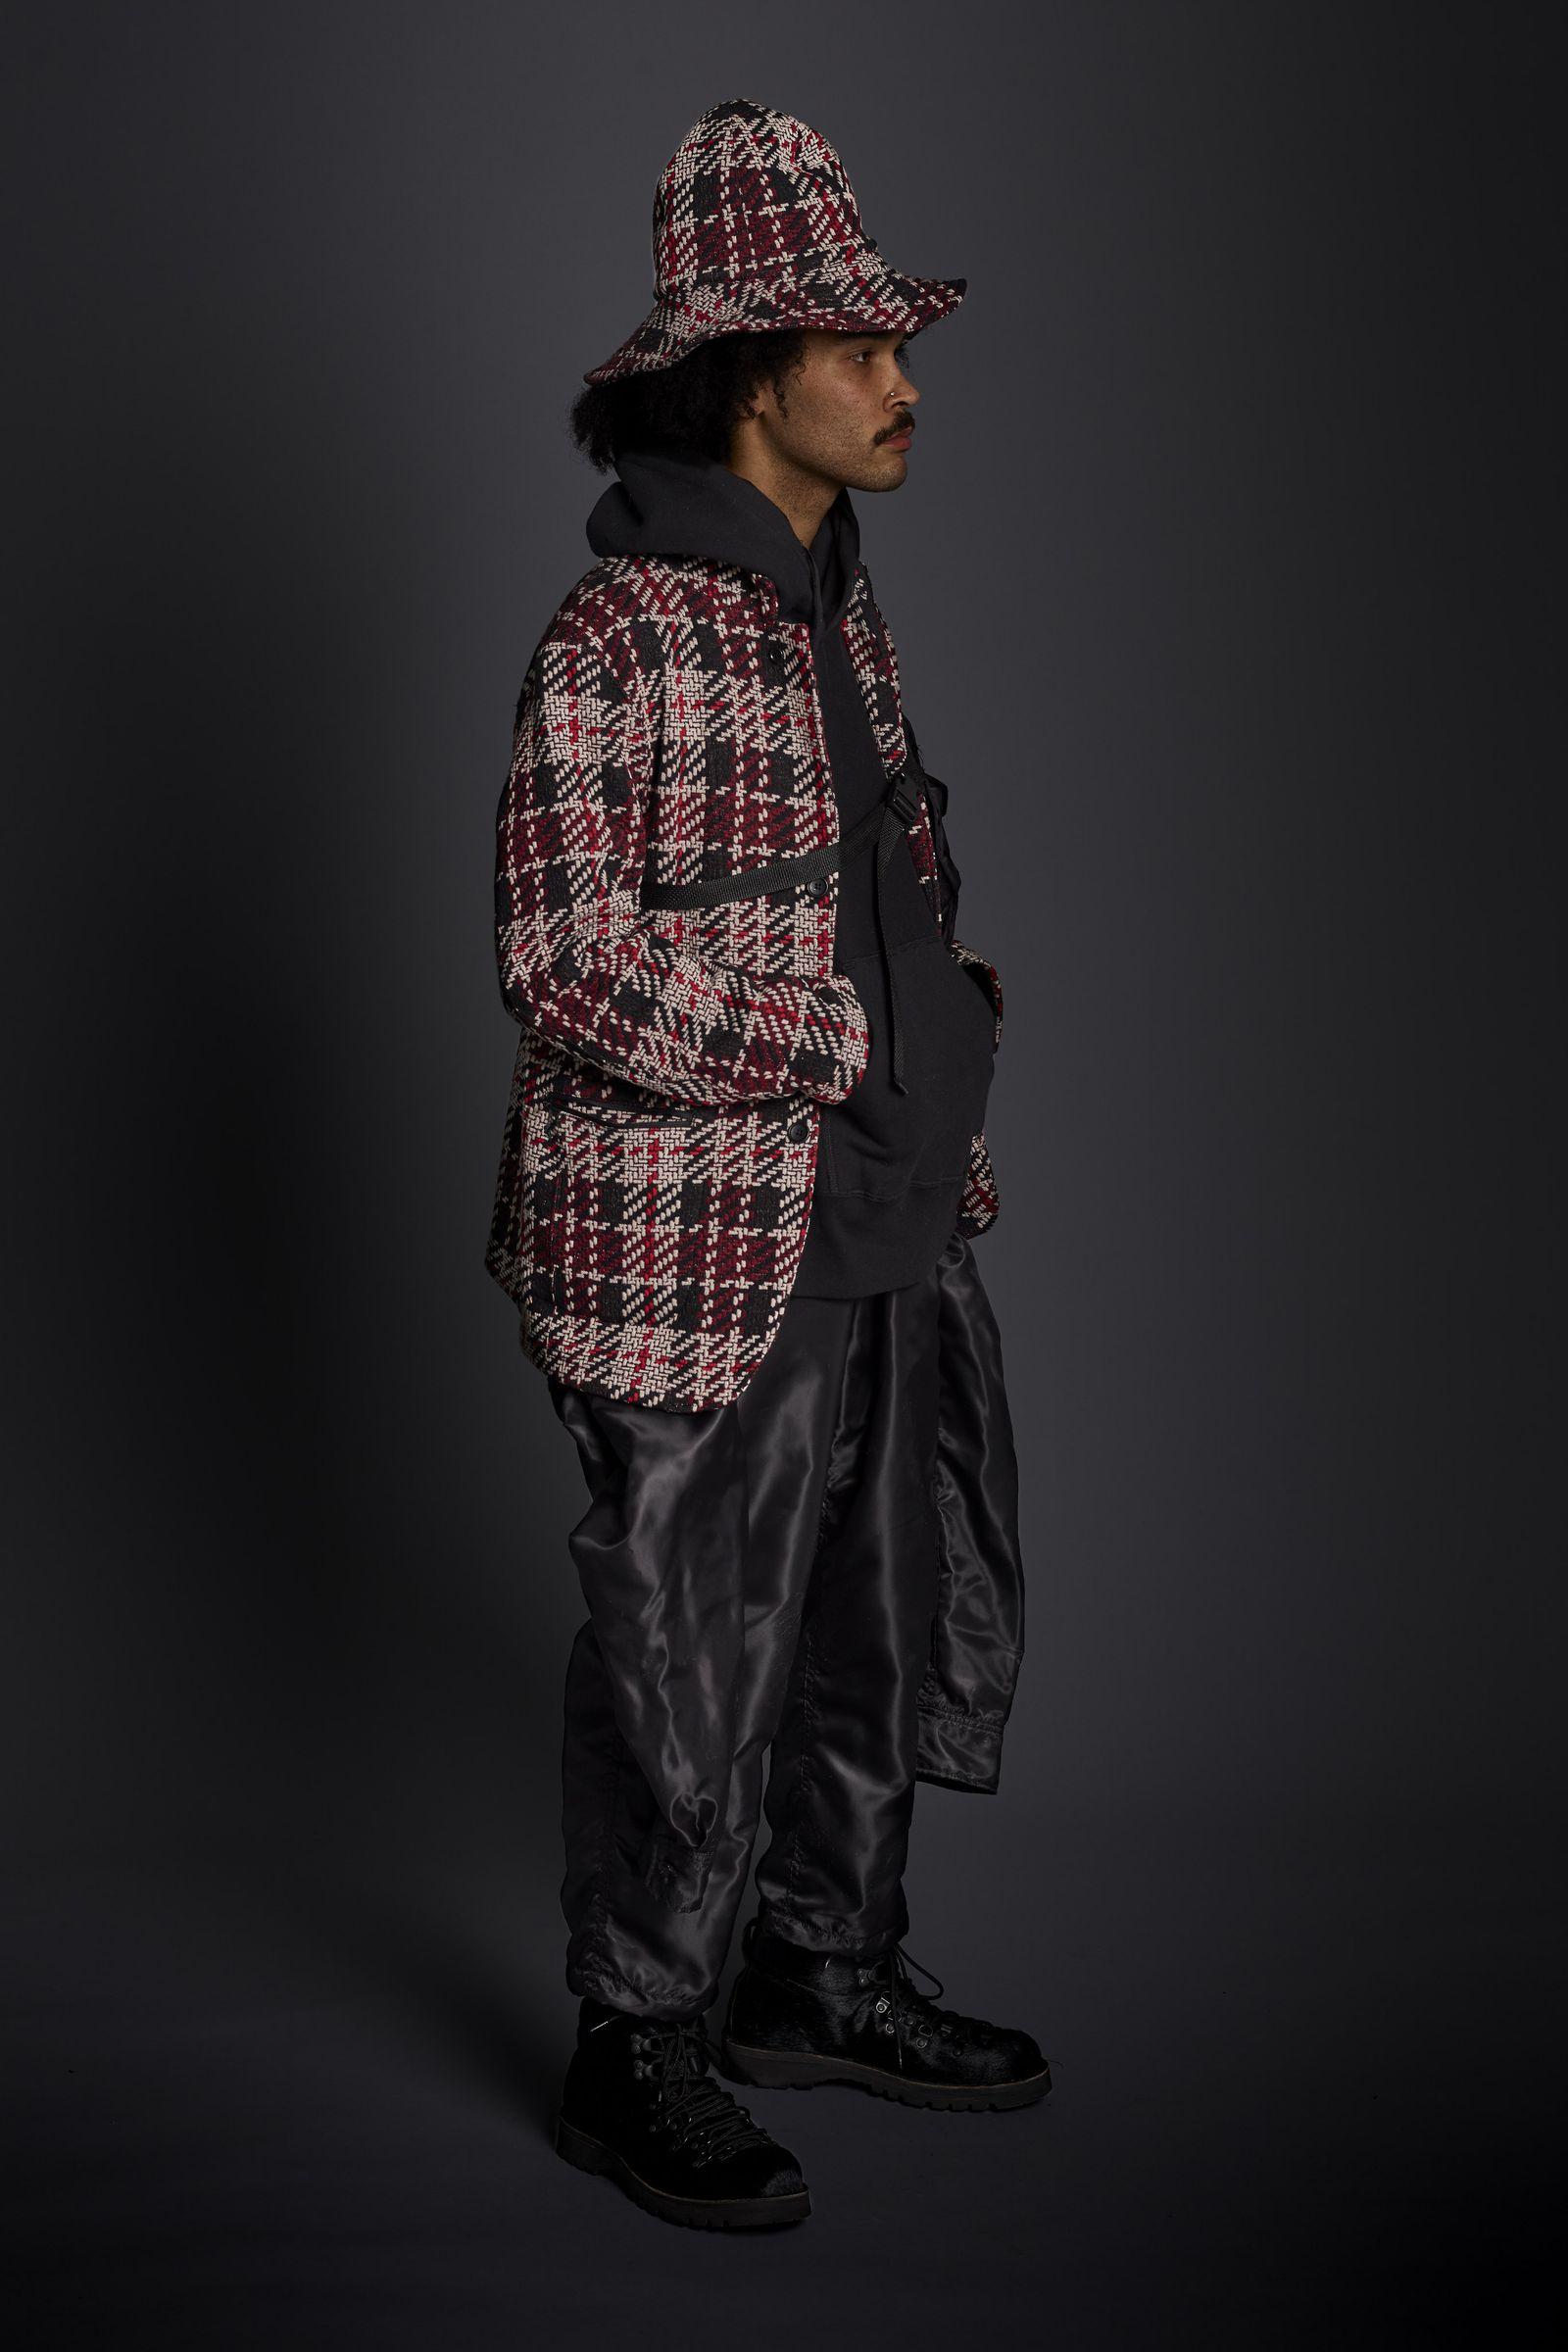 engineered-garments-fall-winter-2020-10